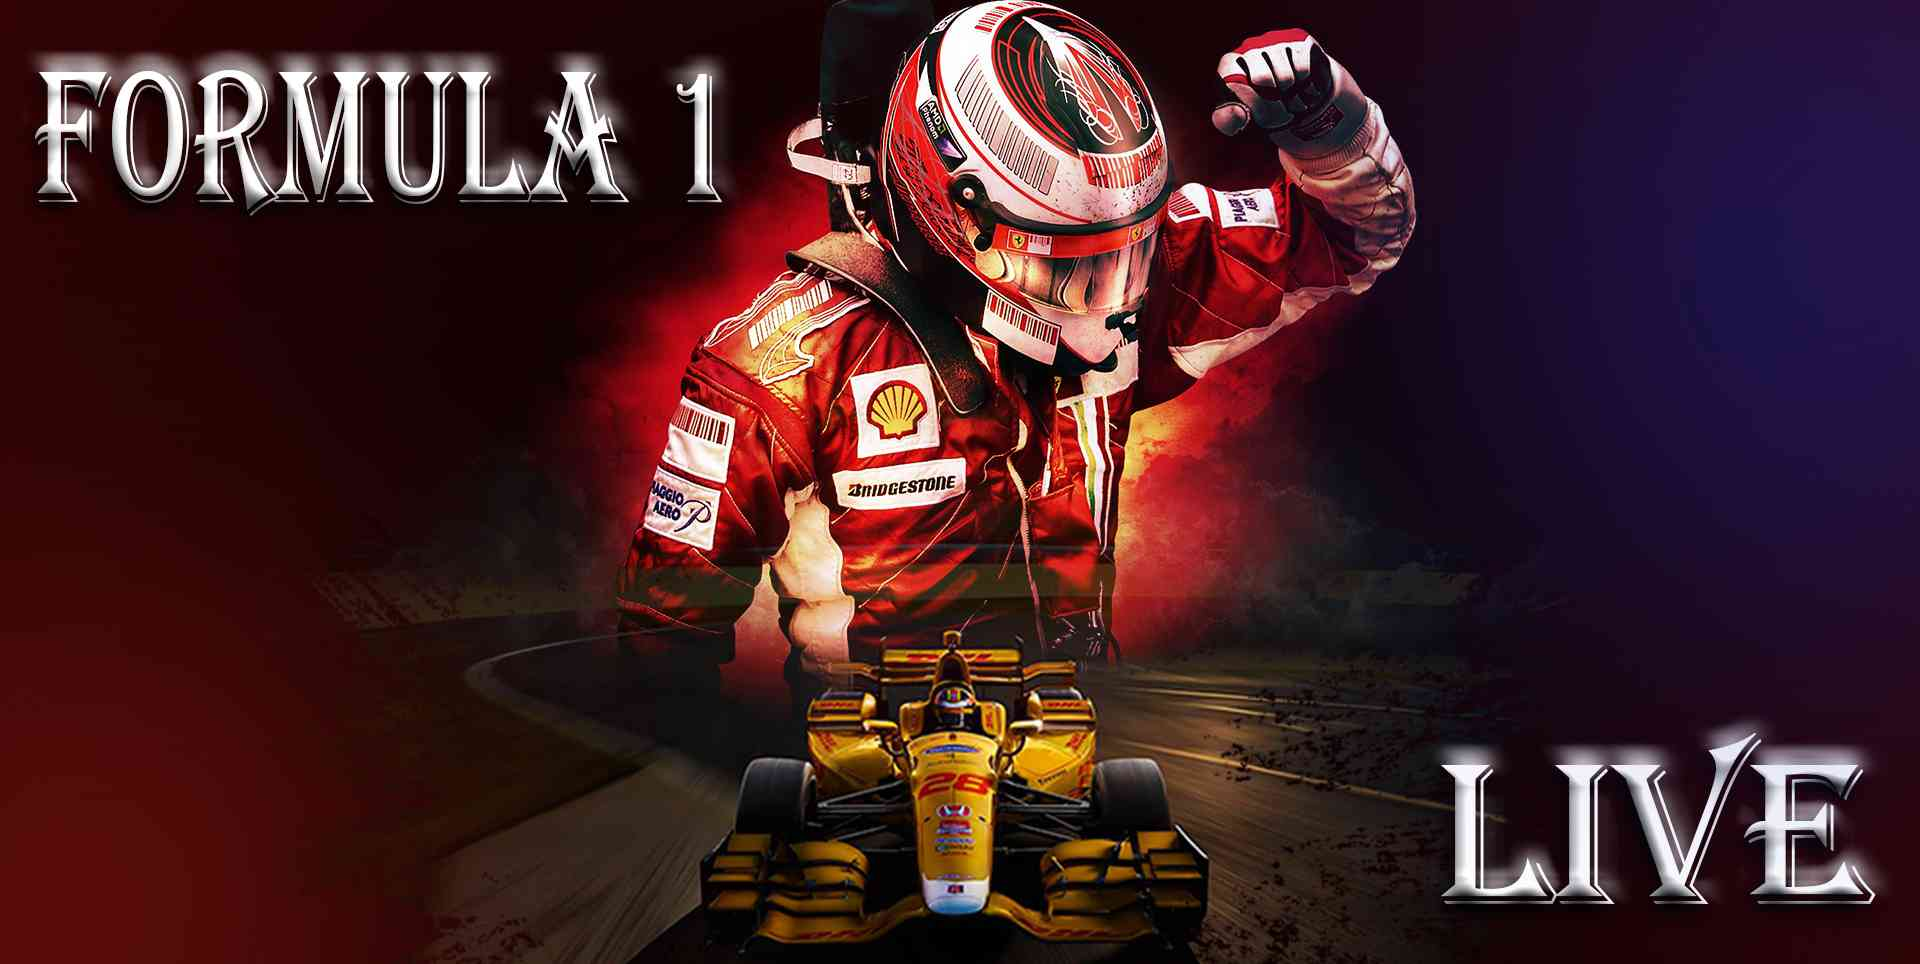 formula-1-grand-prix-silverstone-2016-live-stream